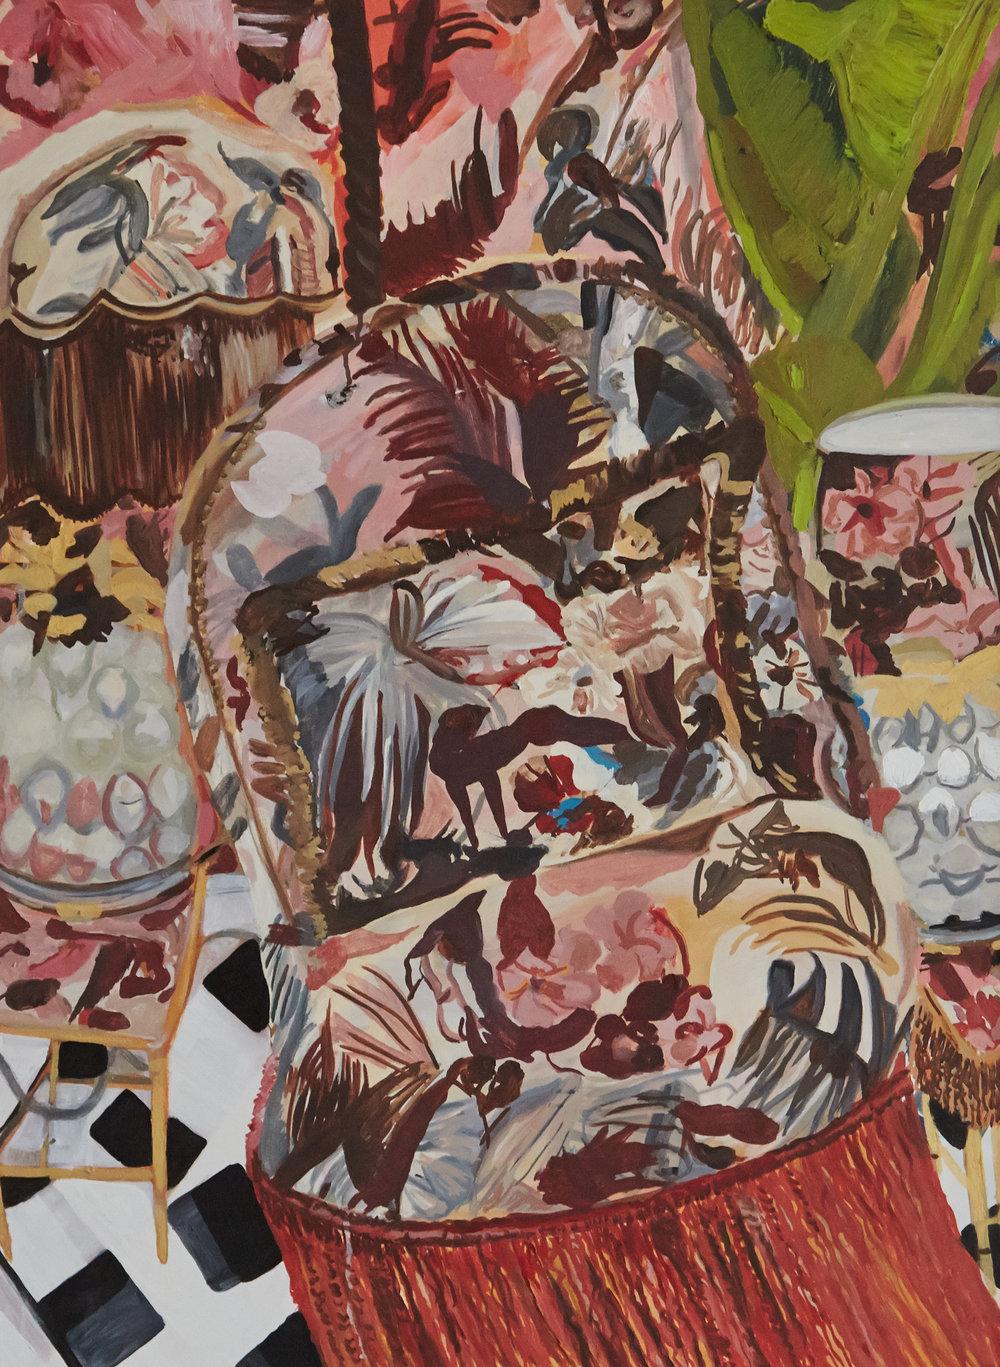 House of Hackney   75 x 57 cms // Oil on canvas